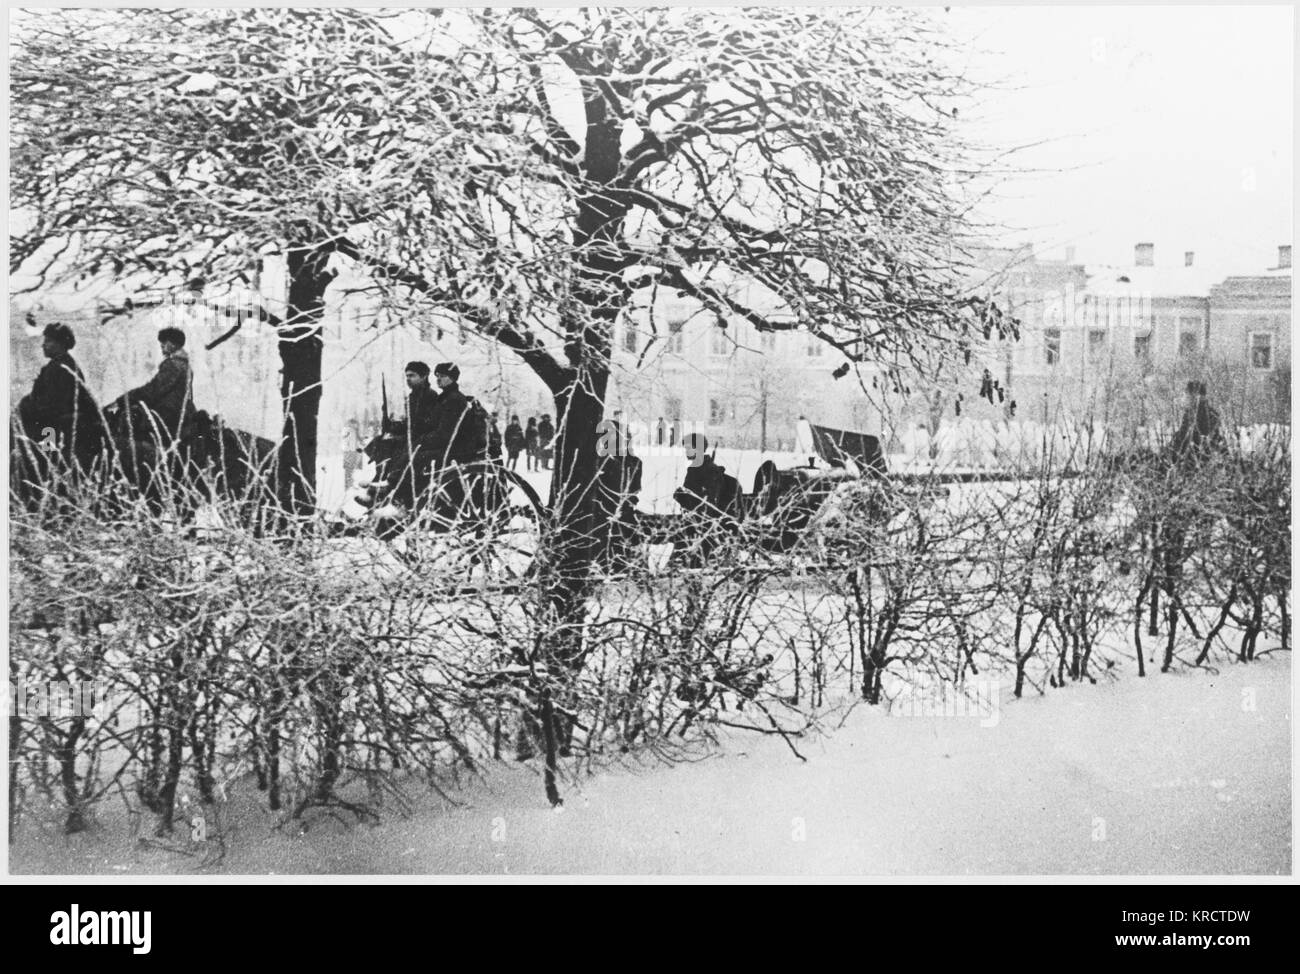 LIBERATION SCENES The liberation of Kalinin. Date: 1942 - Stock Image